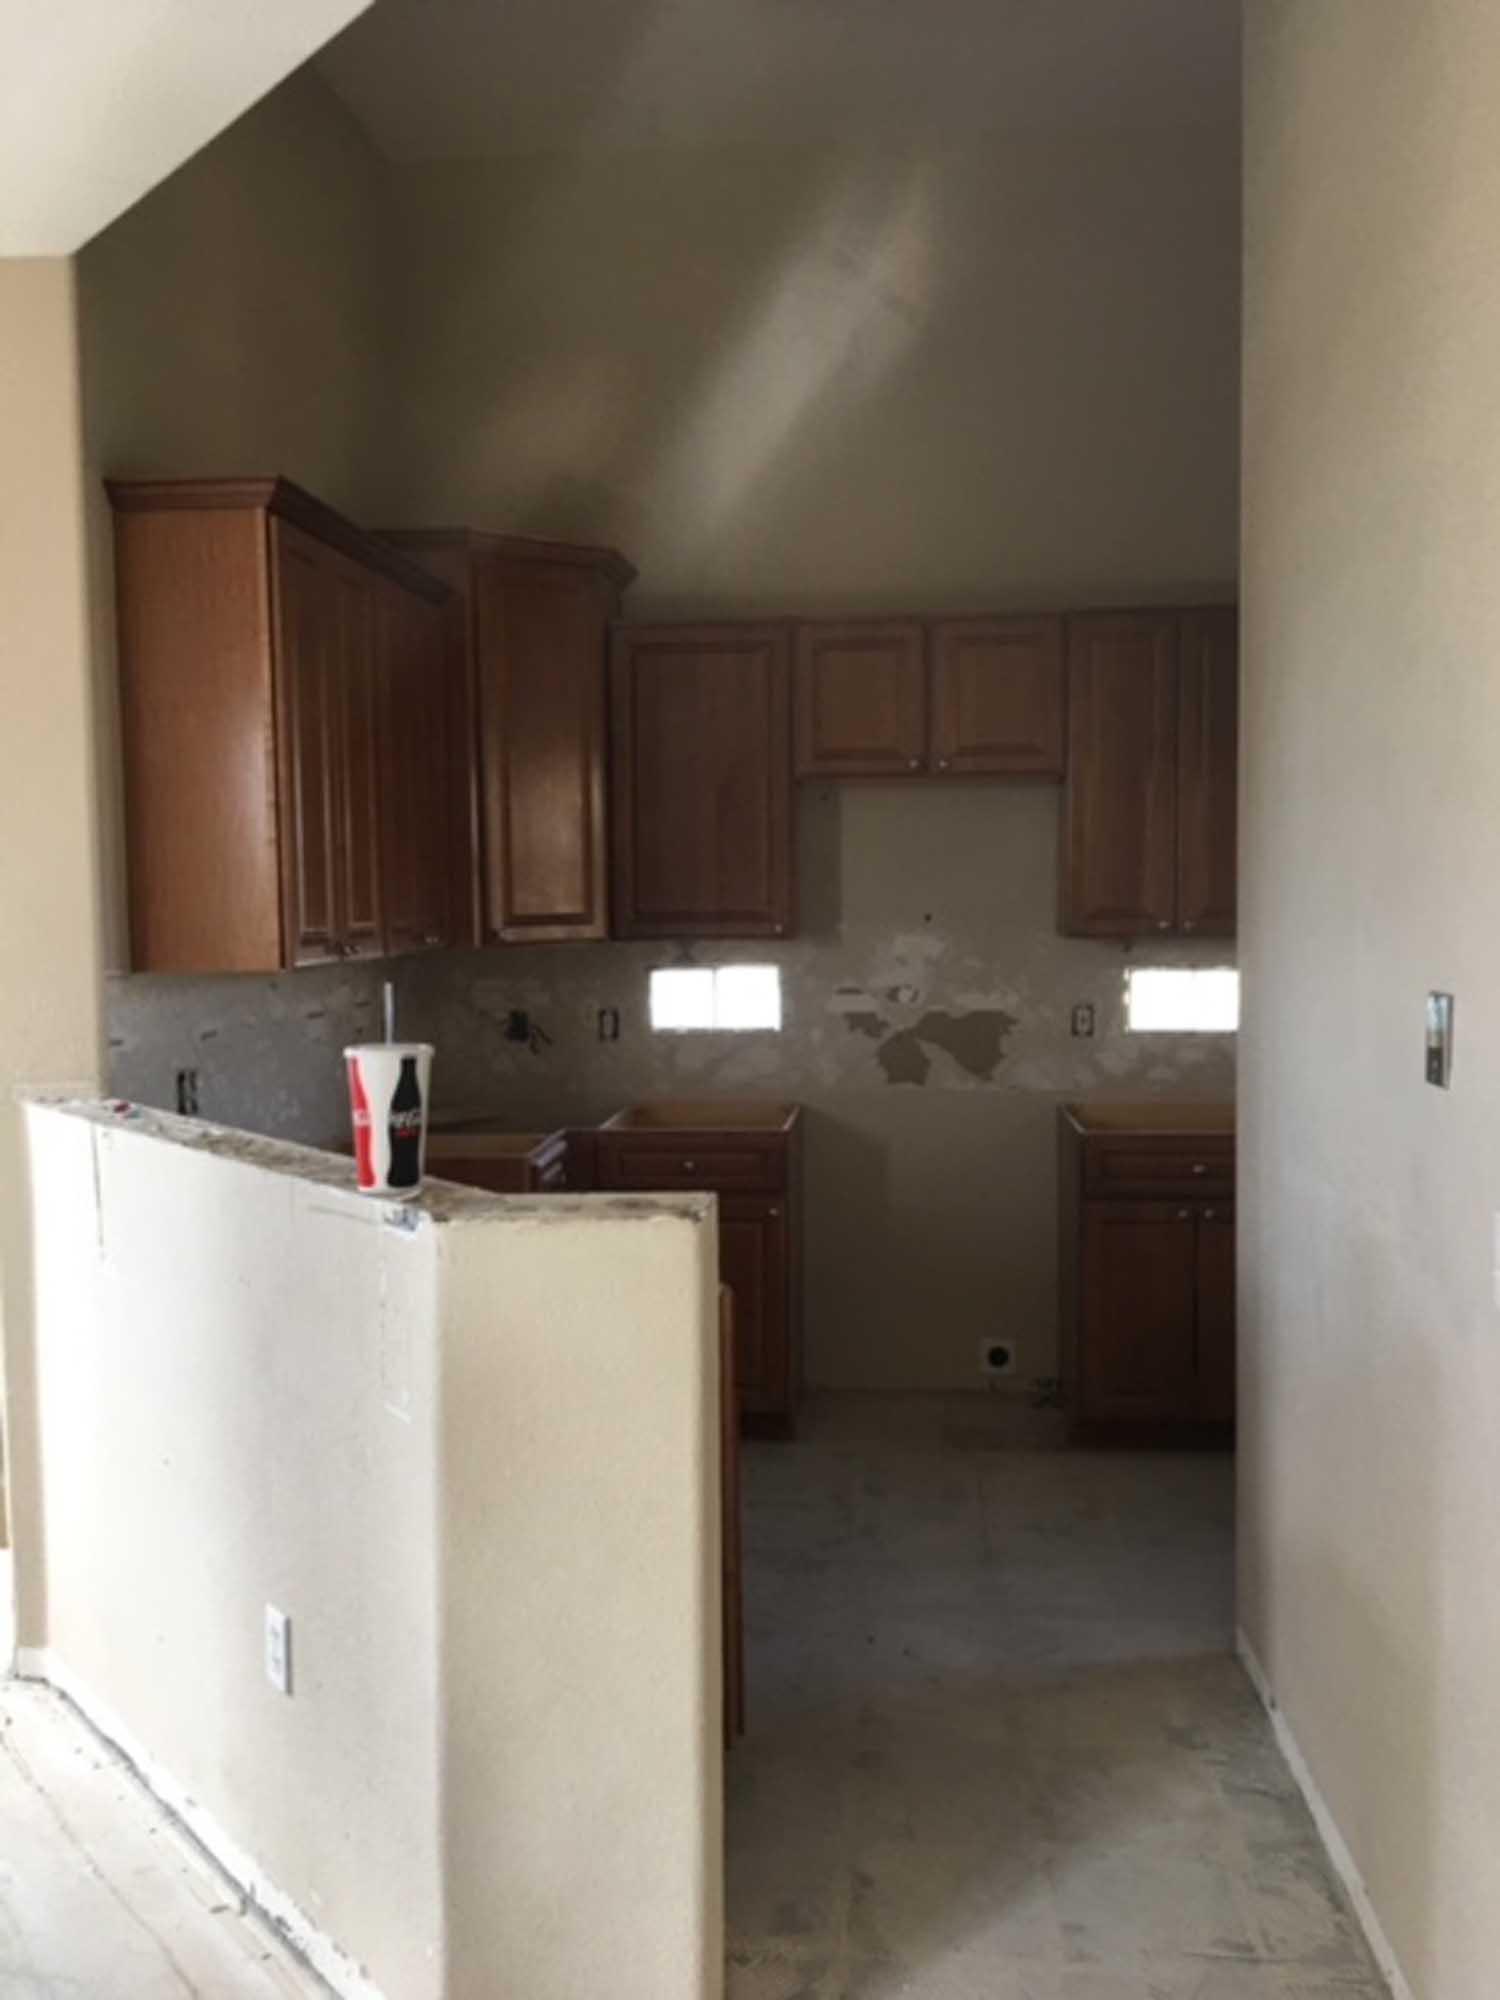 Renovation of kitchen